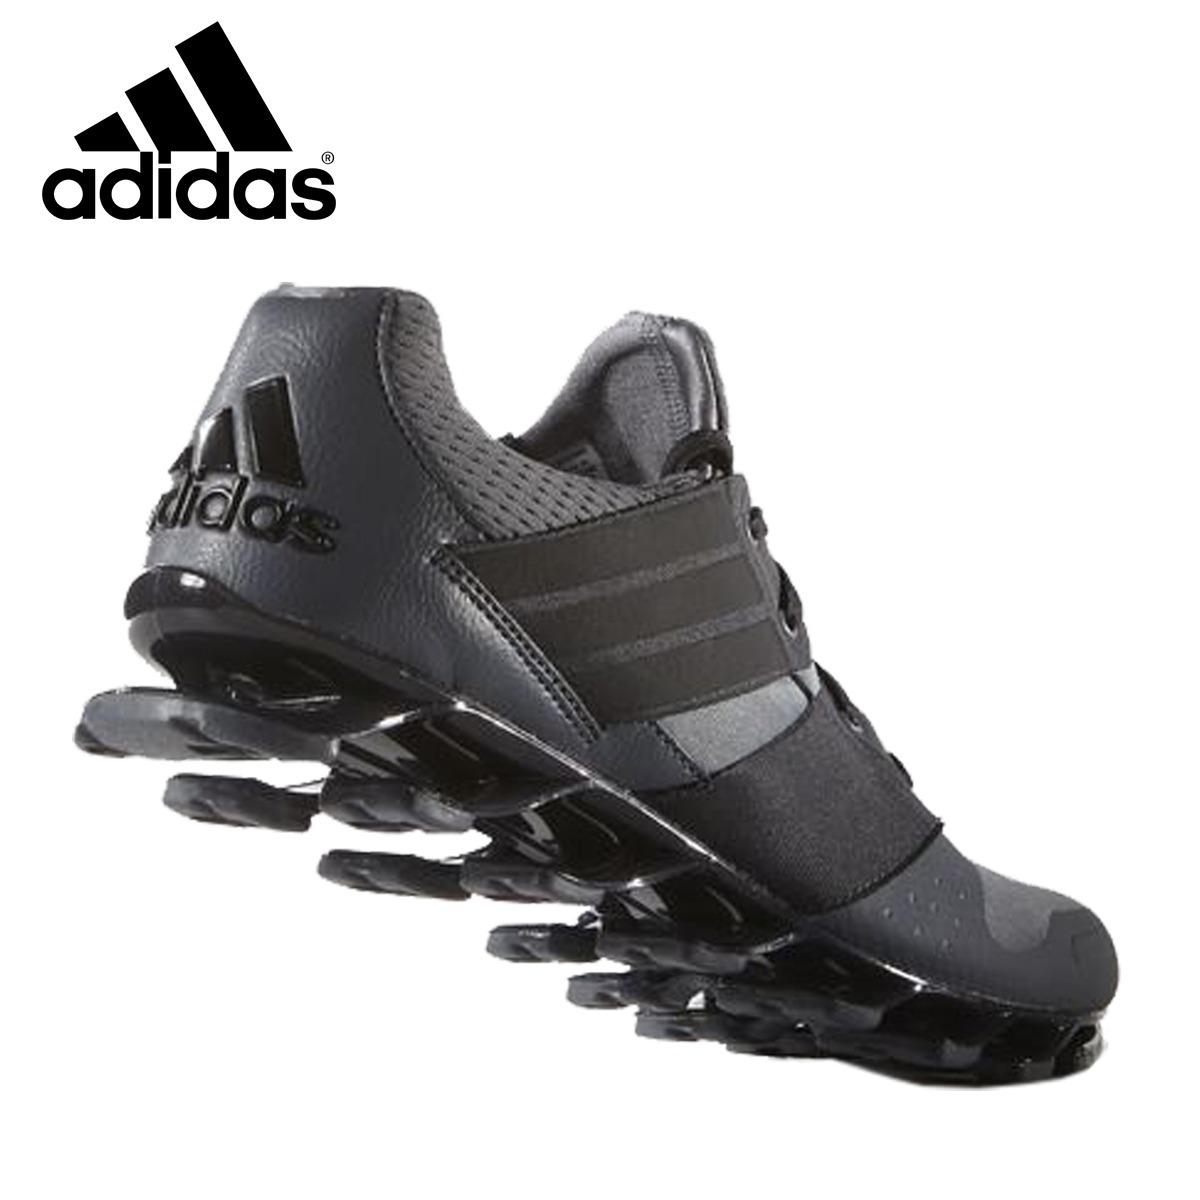 sale retailer 55bbc c5066 ... promo code tenis adidas springblade solyce mens running shoe aq5678.  cargando zoom. 65132 20d93